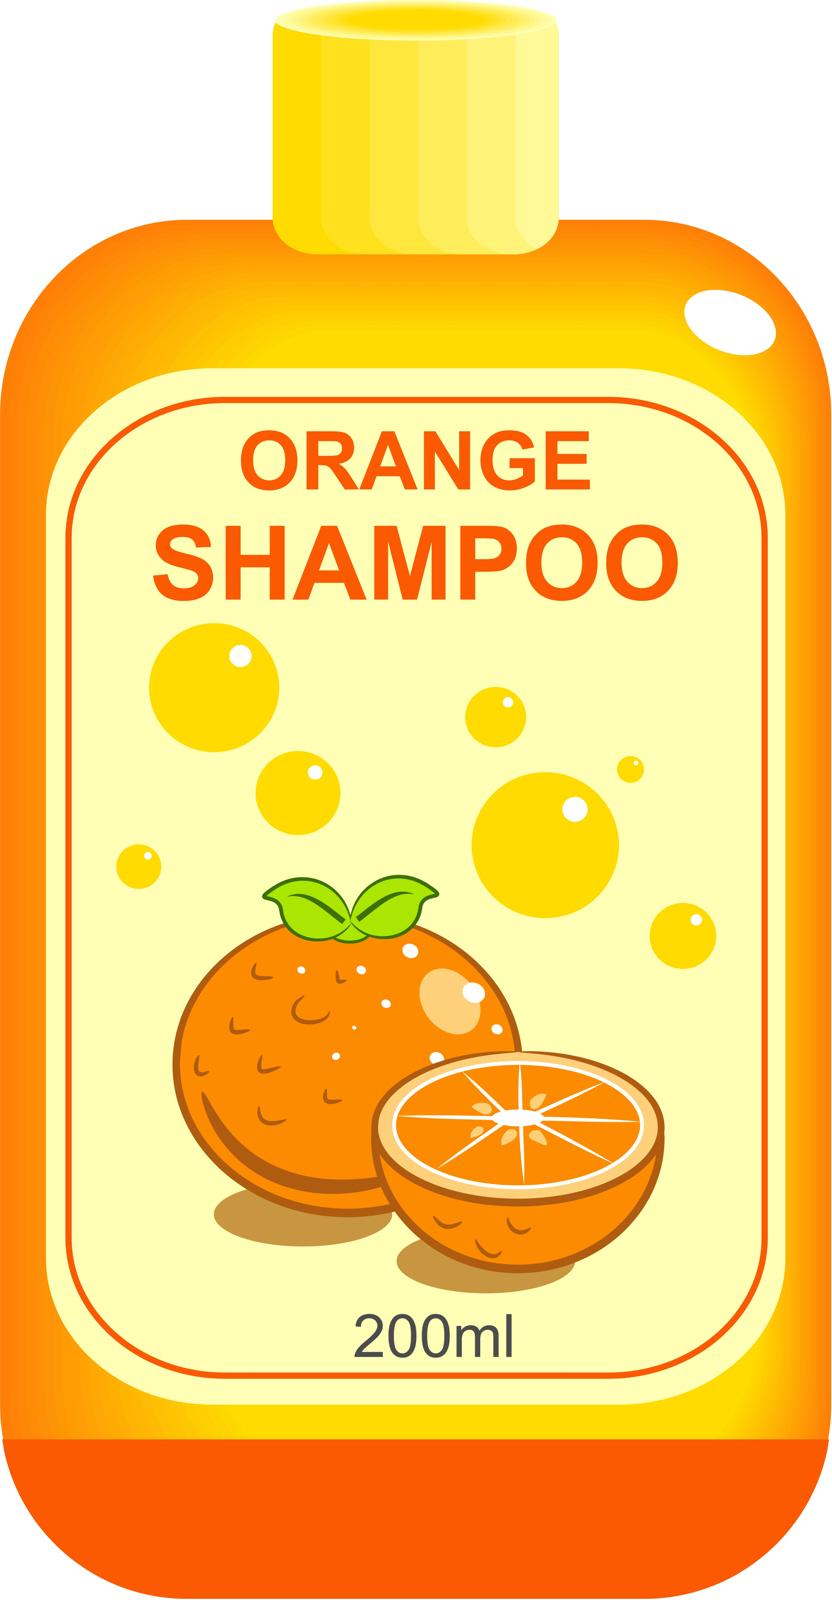 free stock photo 9467 orange shampoo freeimageslive rh freeimageslive co uk shampoo clipart black and white shampoo clipart free